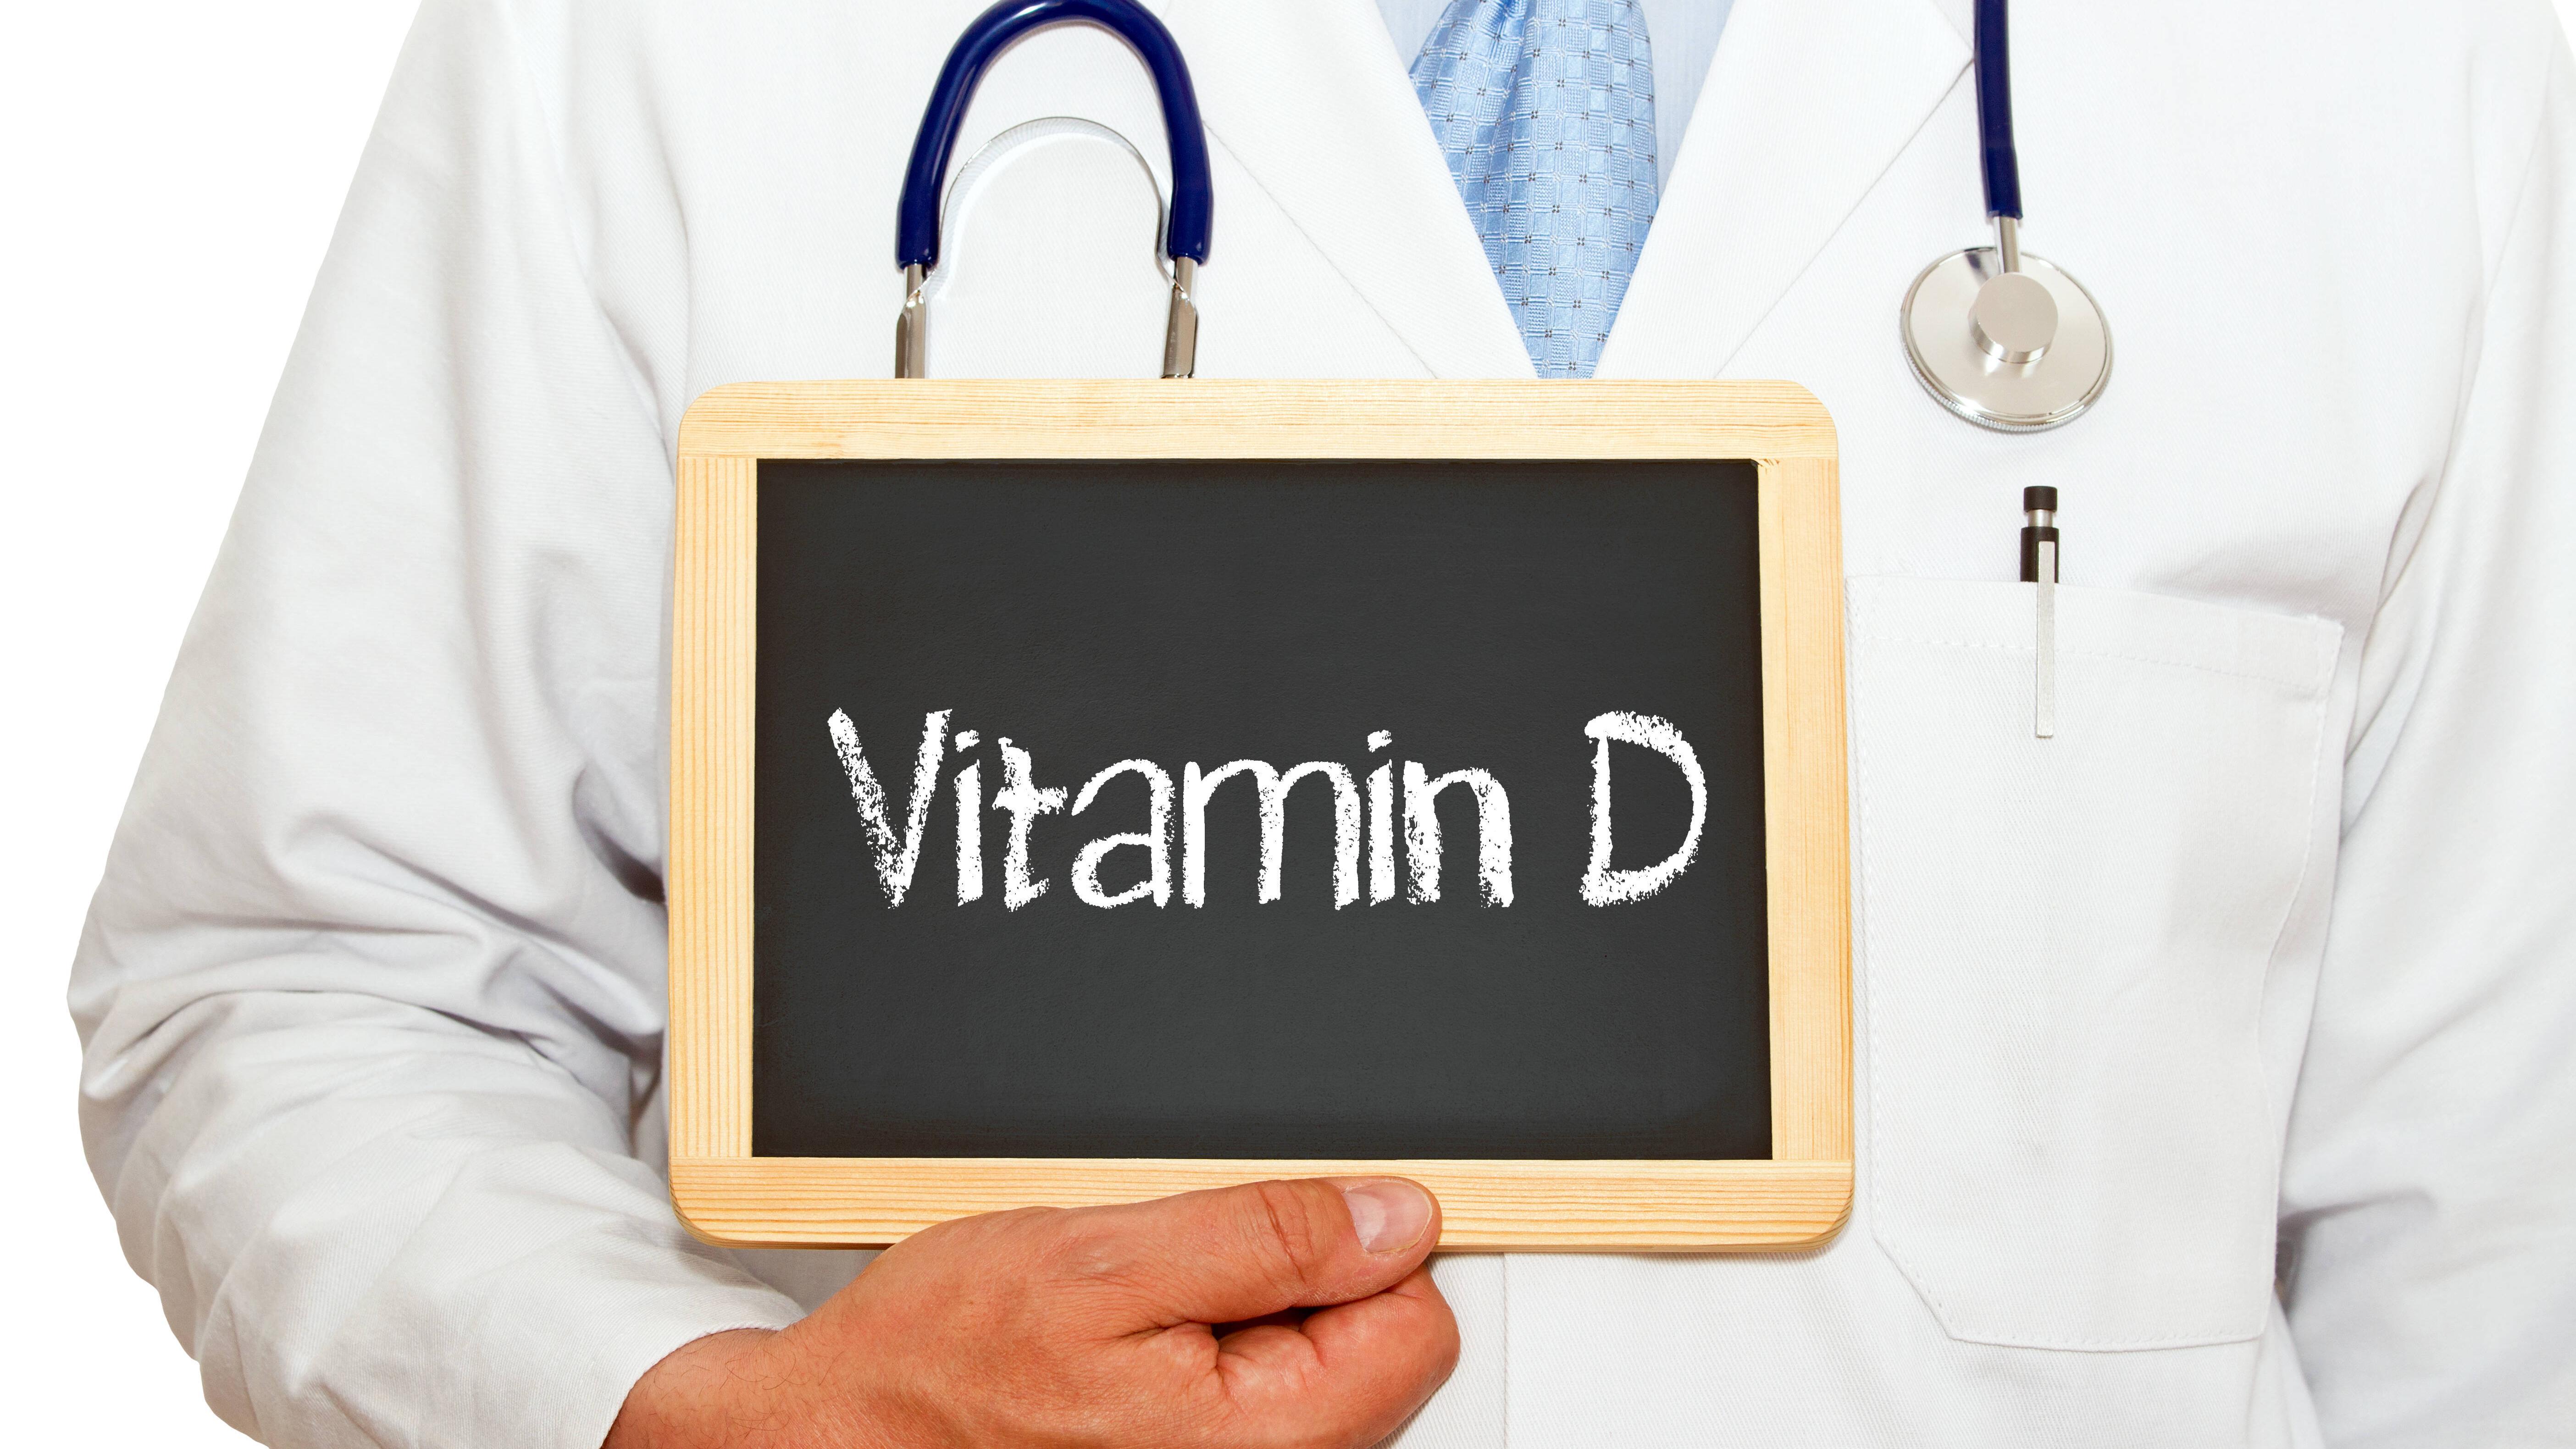 Ob Vitamin D vor Covid-19 schützen kann, ist unklar.